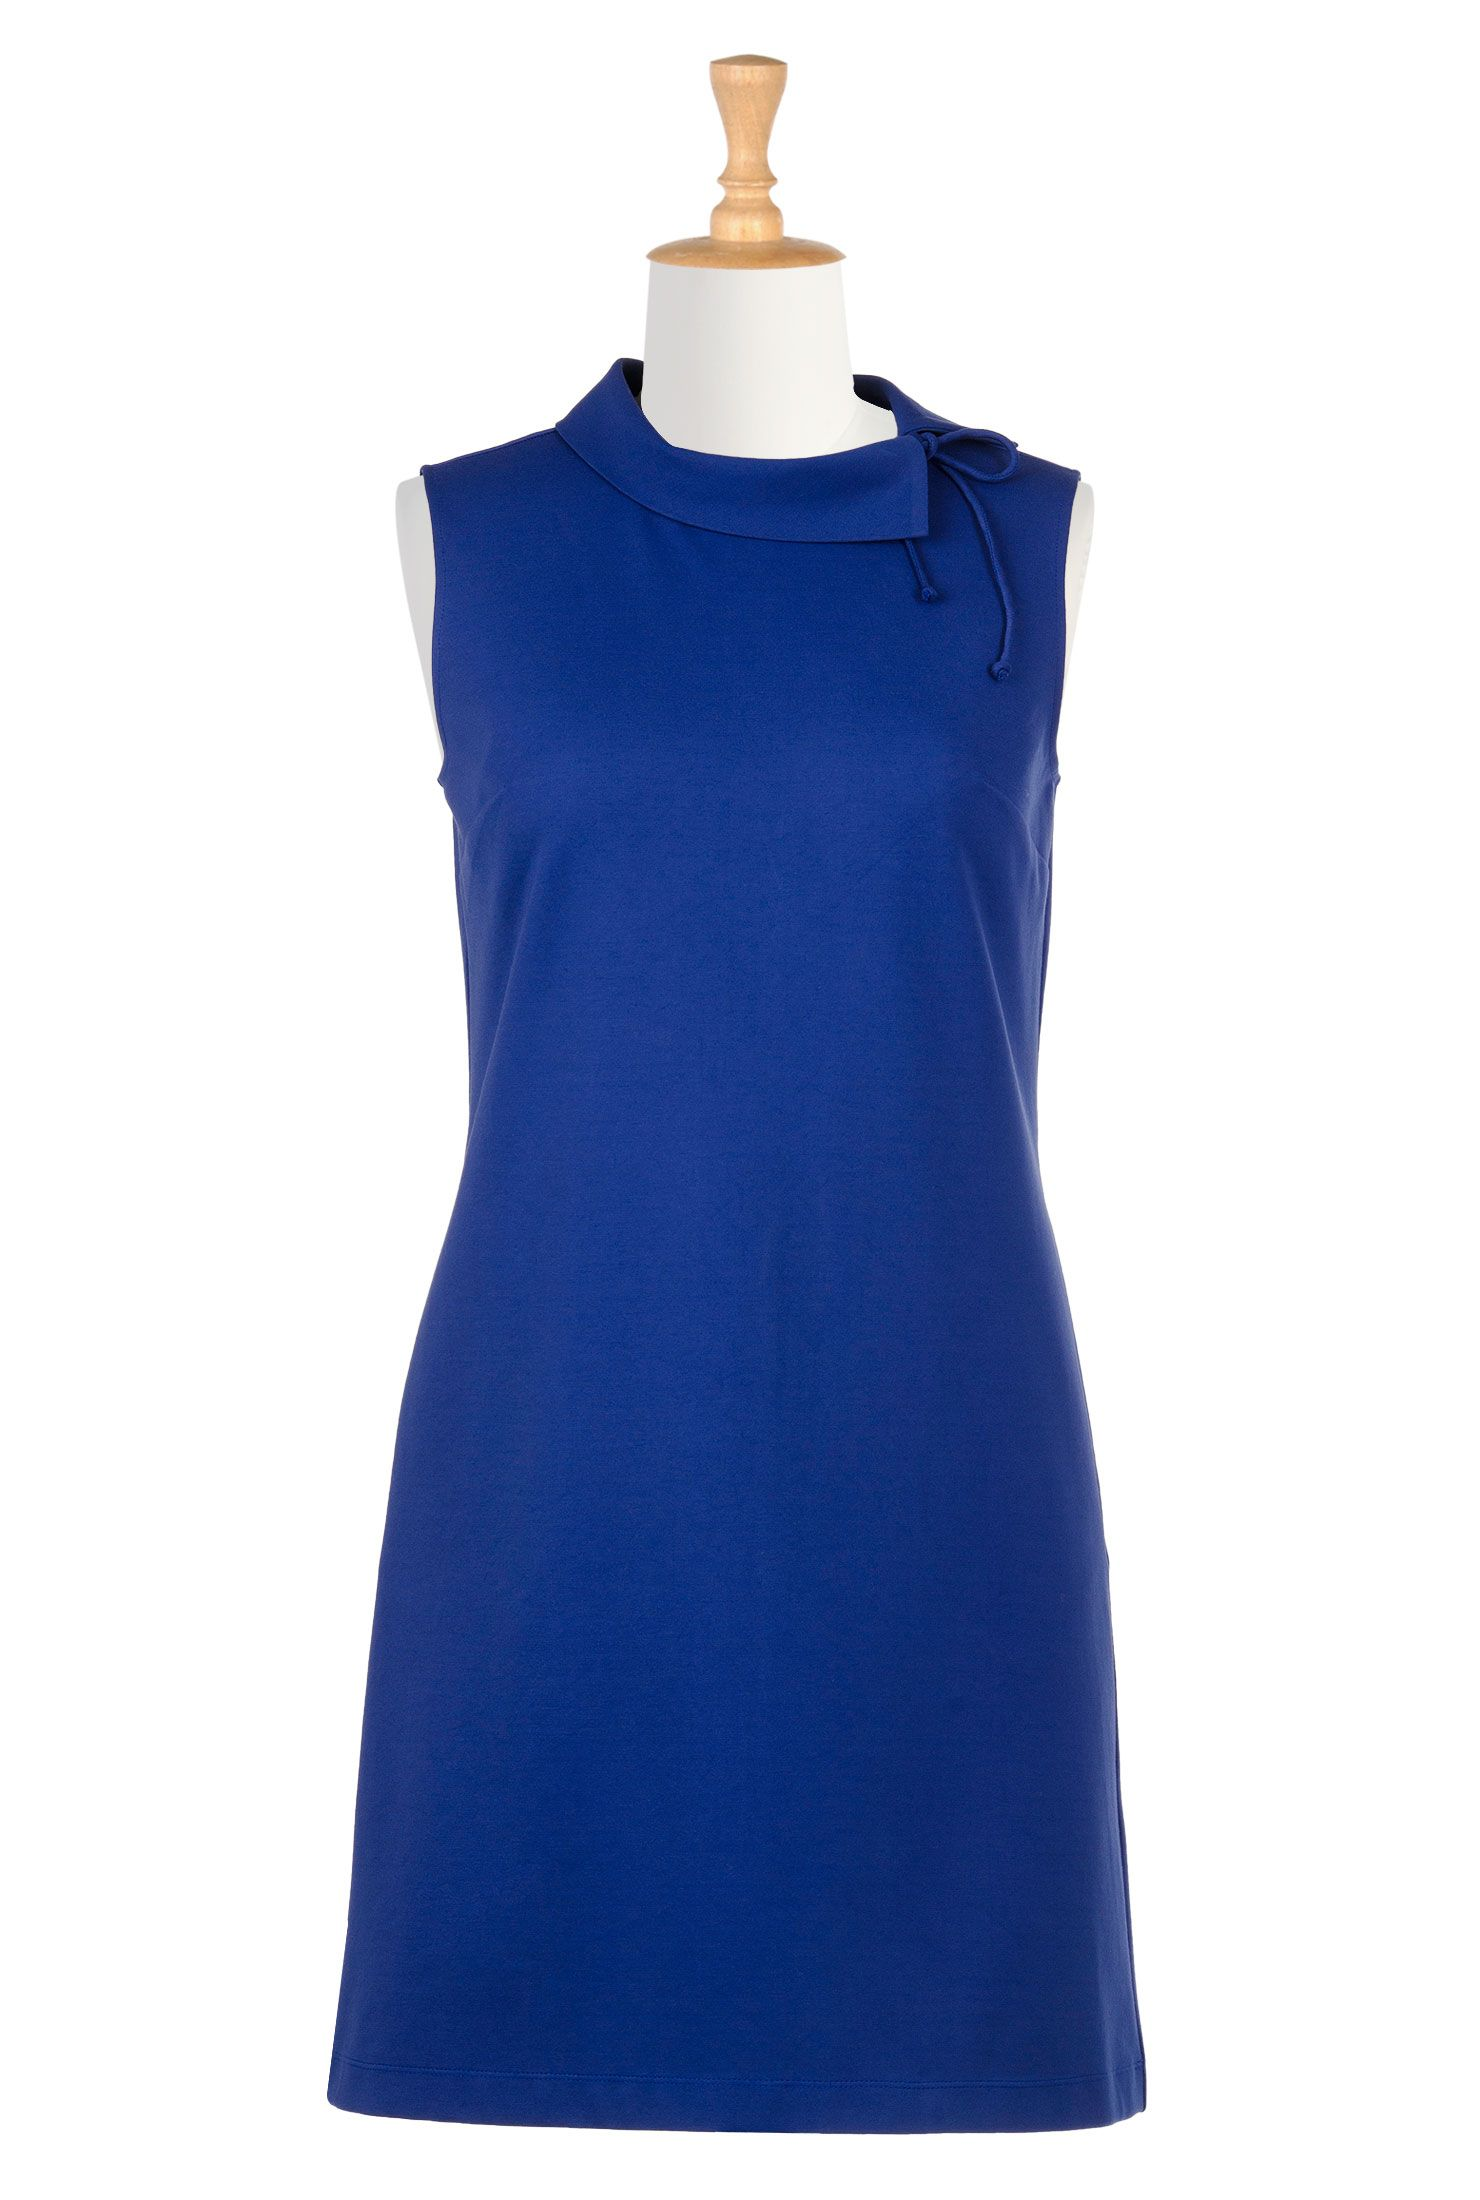 1960s Style Dresses- Retro Inspired Fashion   1960s shift ...